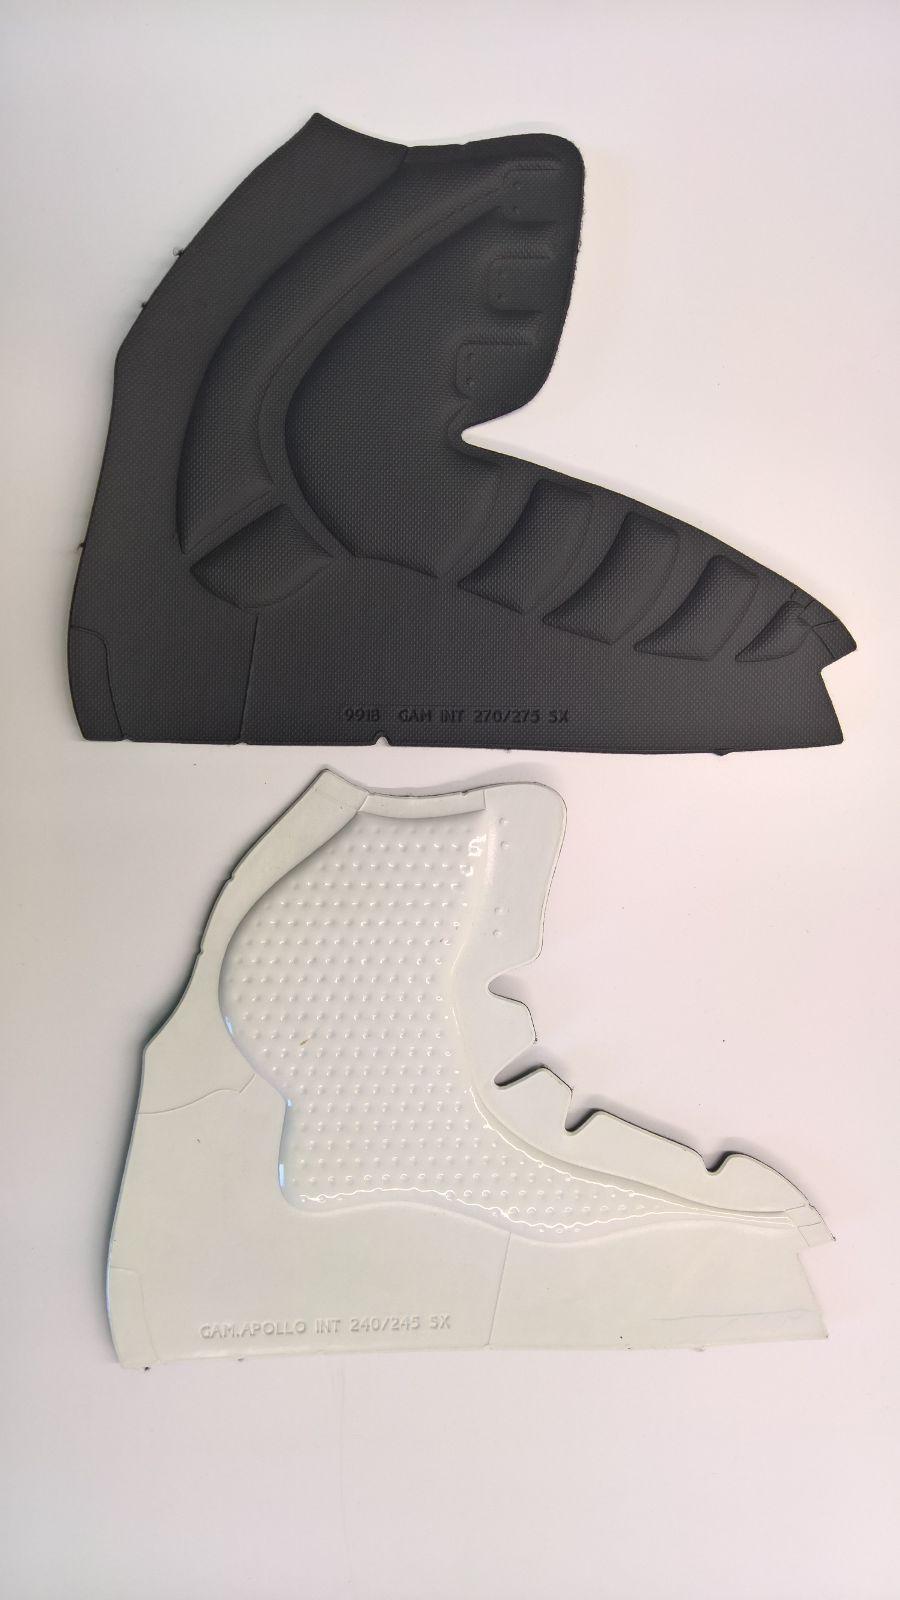 Gambetti termoformati scarponi  Teamform